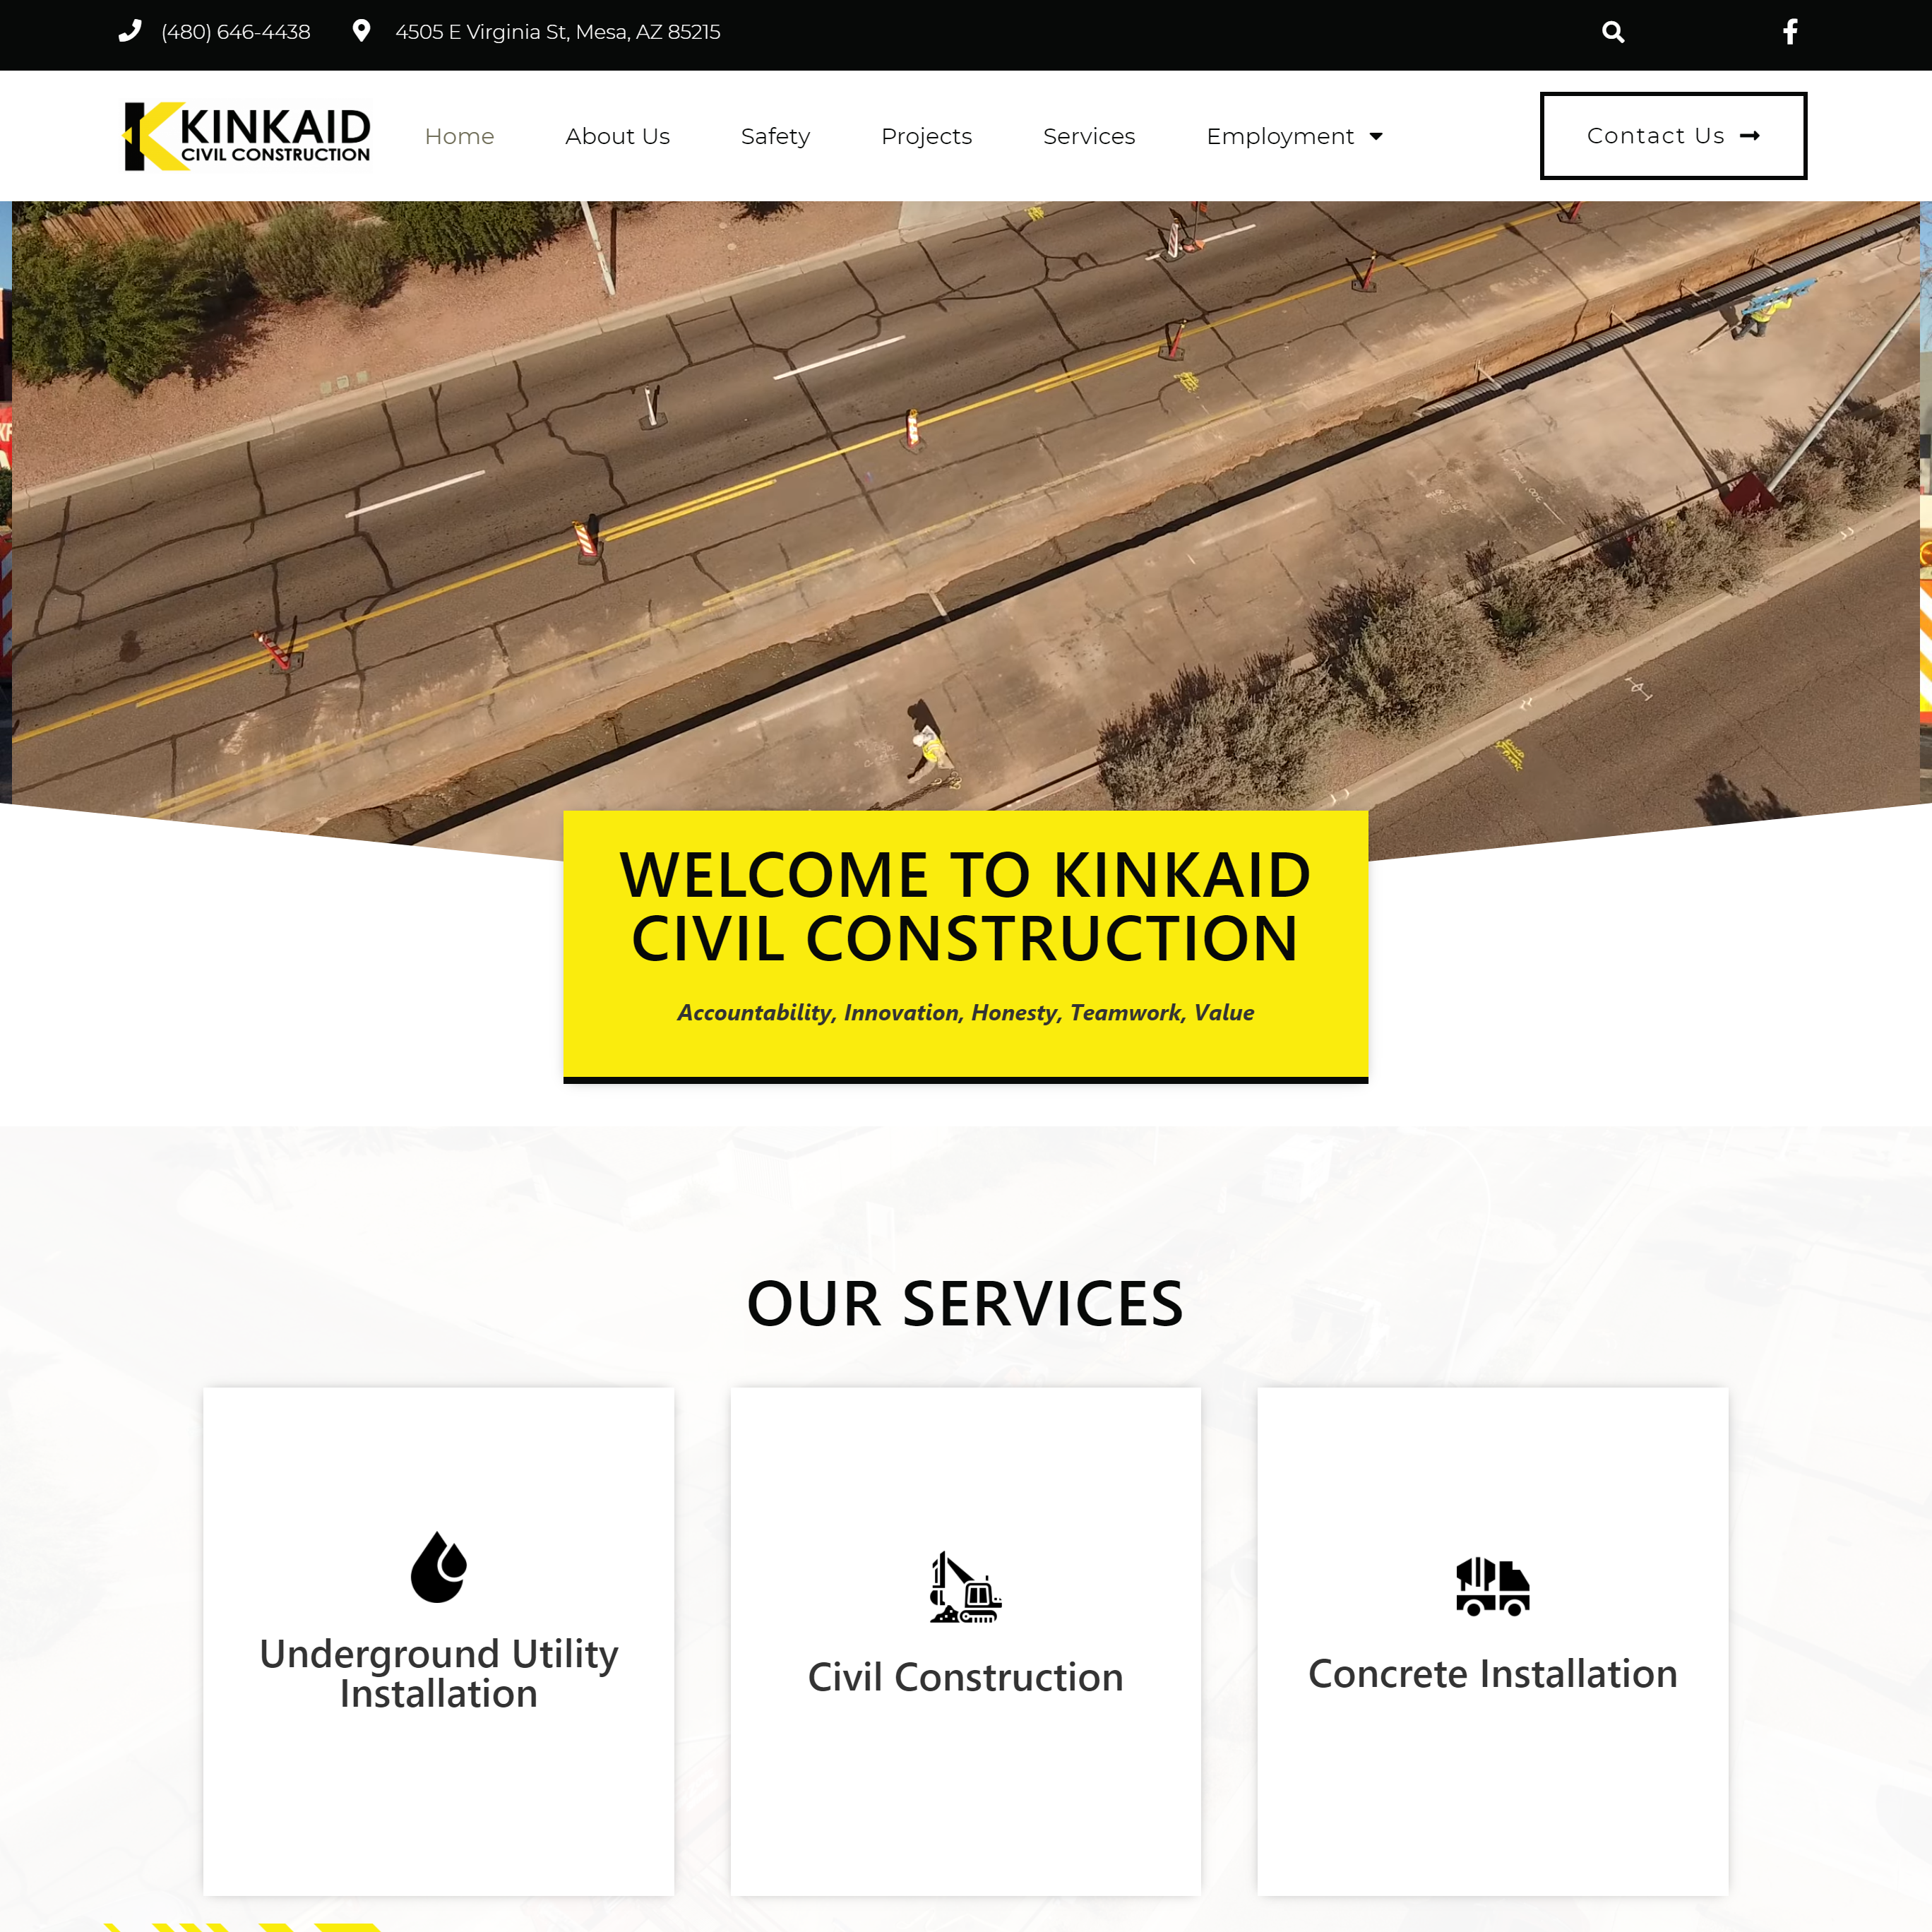 Kinkaid Civil Construction